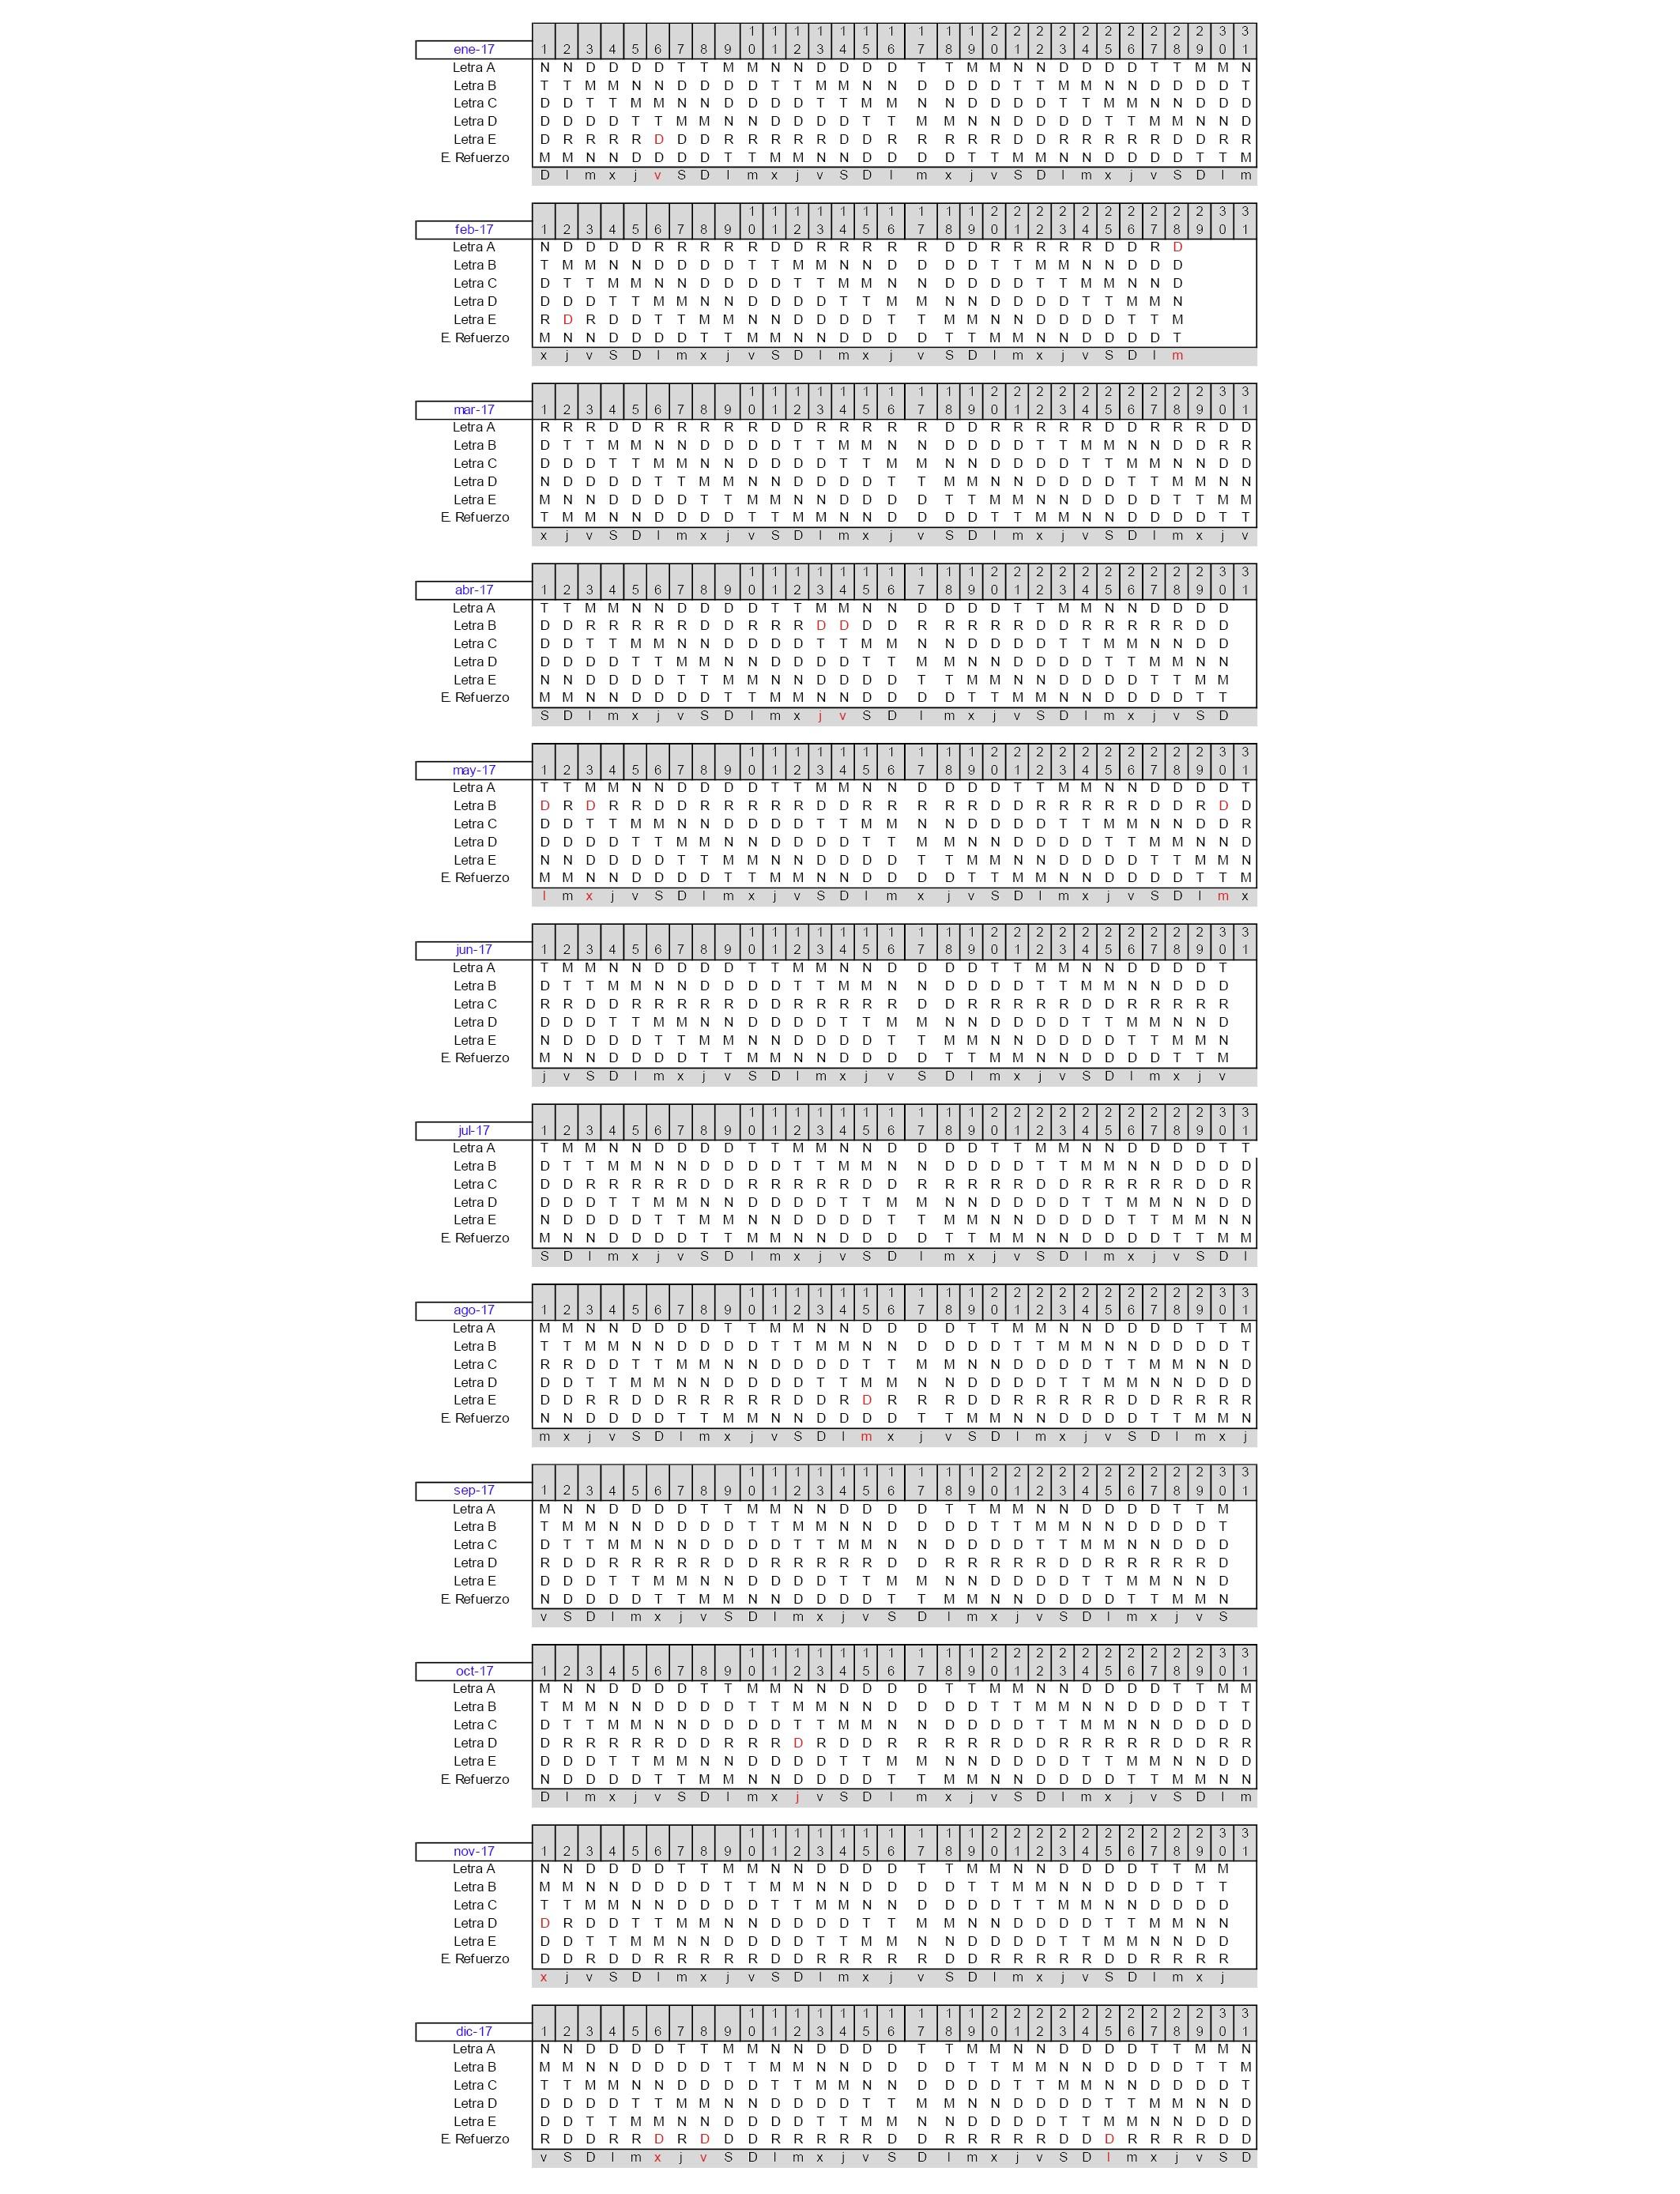 Calendario 2019 Lunas Más Actual Boe Documento Boe A 2016 5551 Of Calendario 2019 Lunas Más Arriba-a-fecha ashley Sellers Aaseller2319 On Pinterest